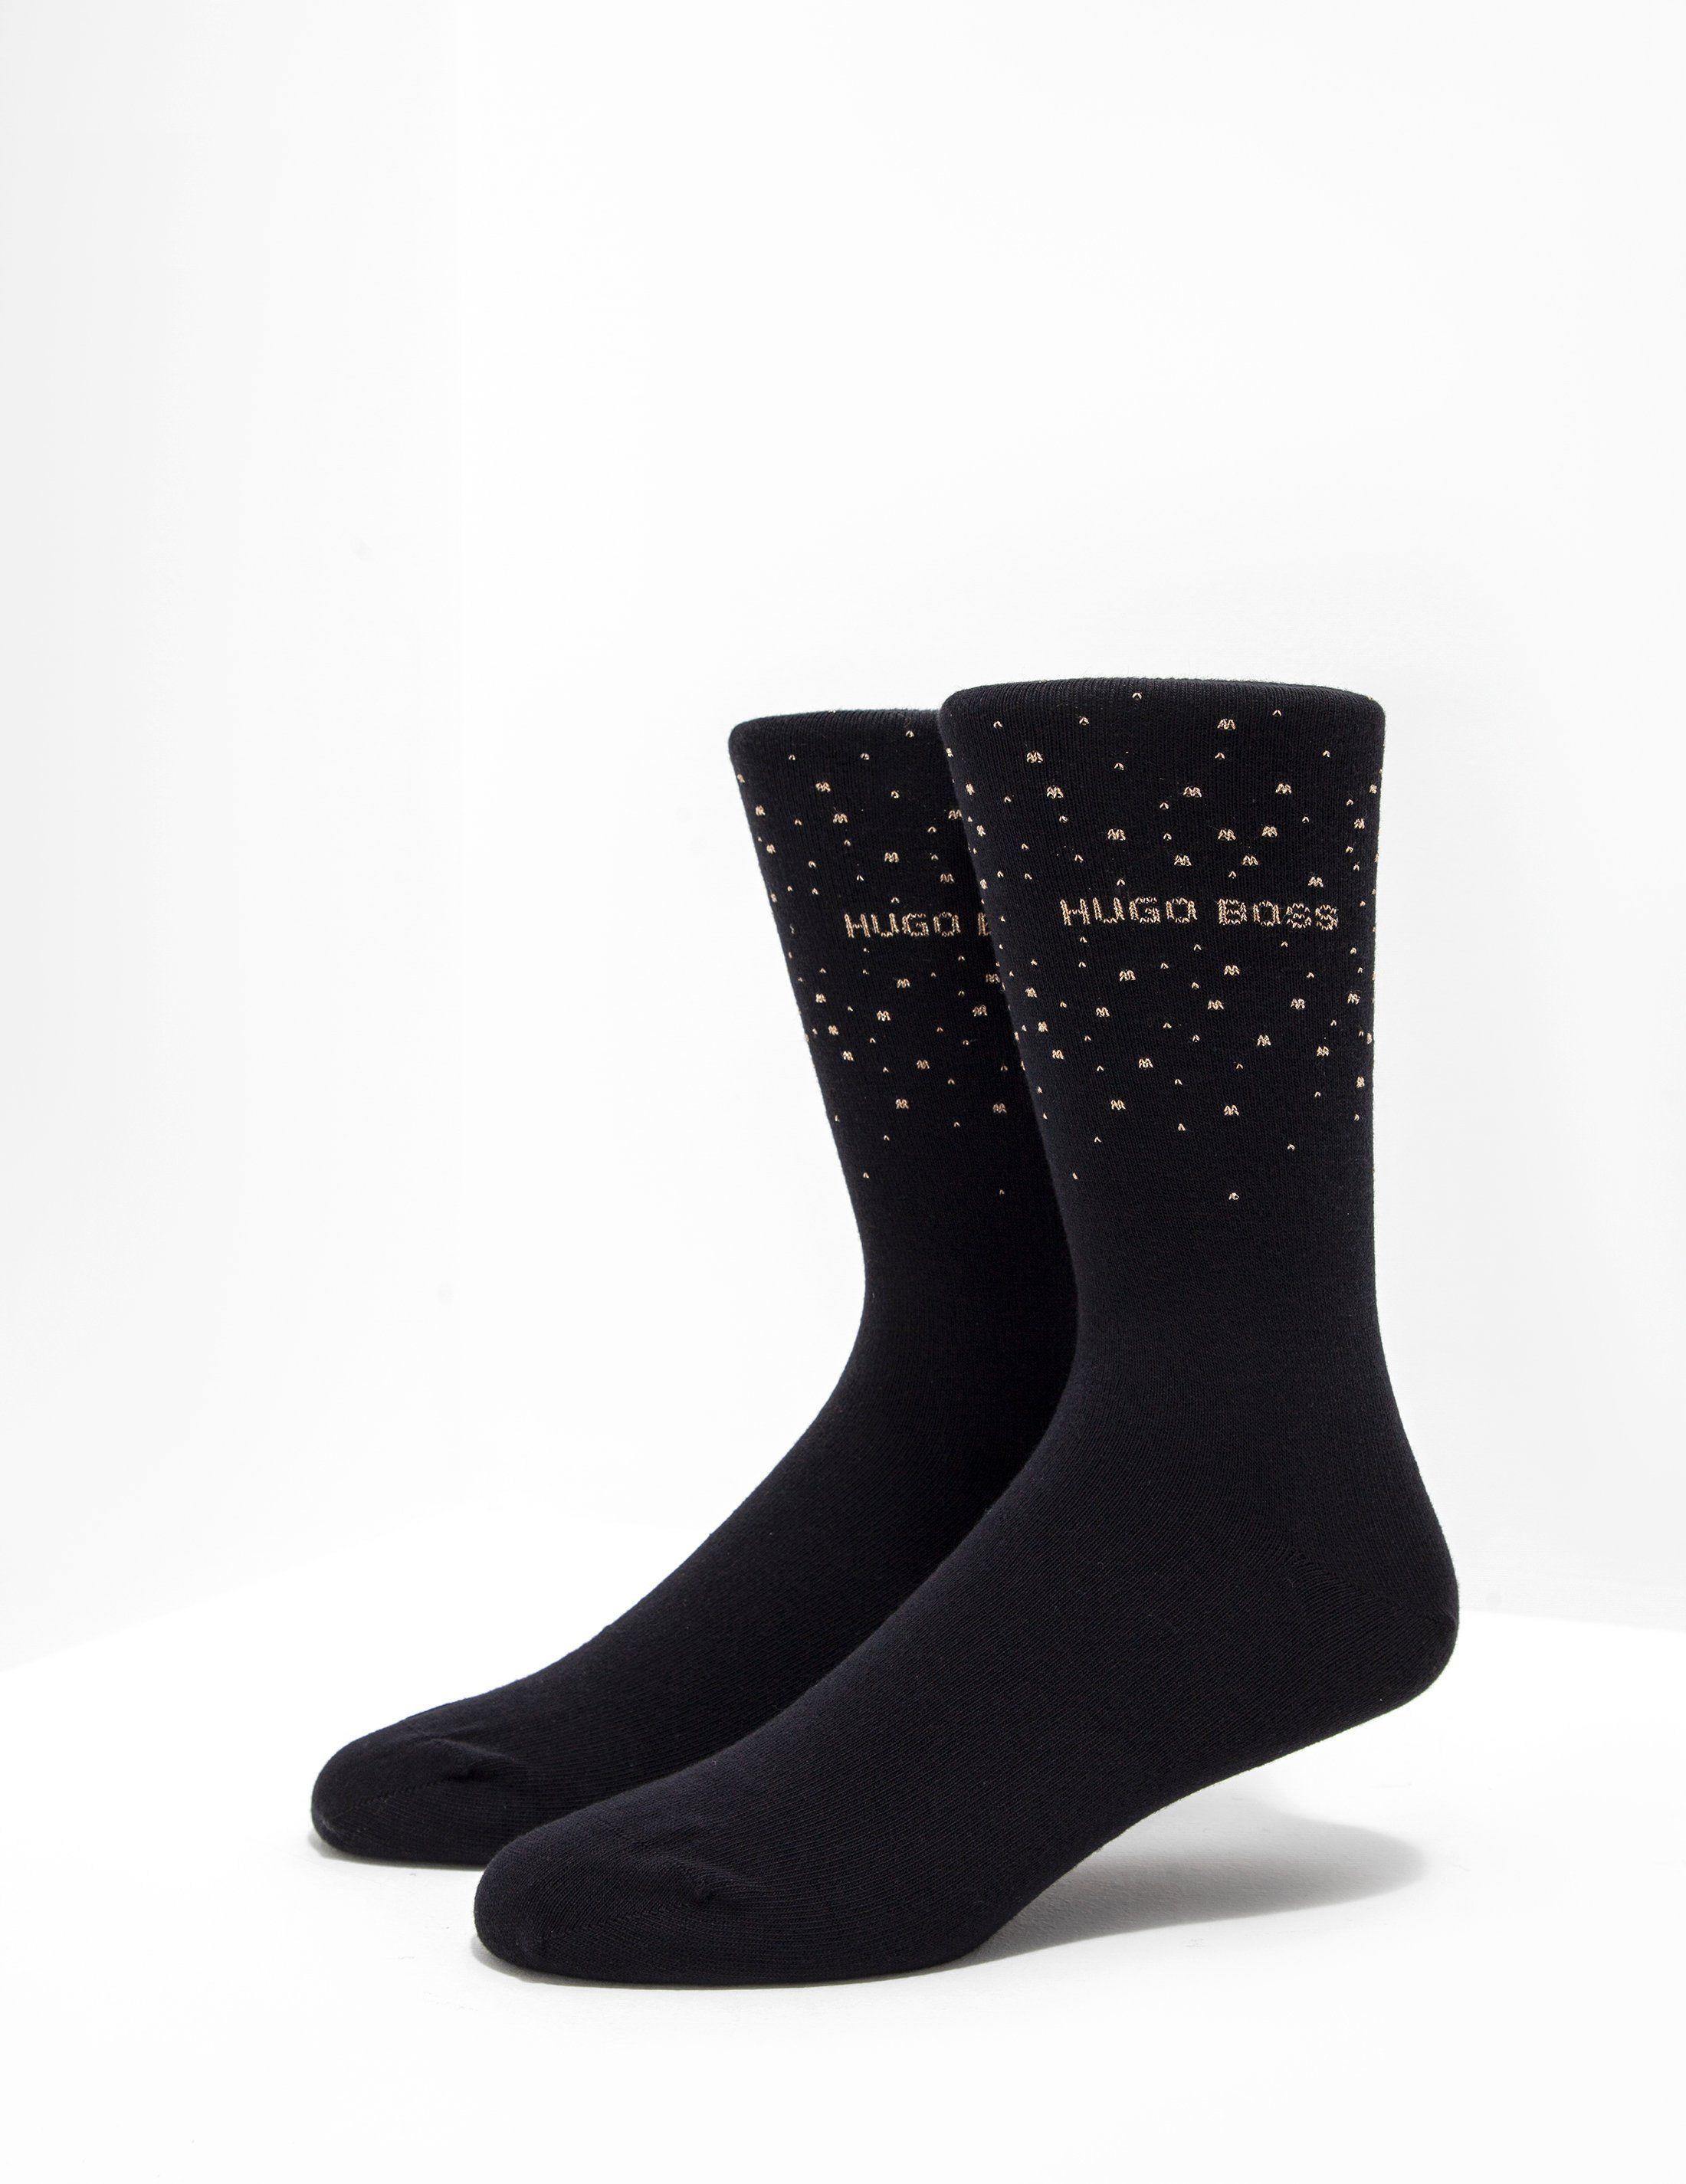 BOSS Boxer Shorts And Socks Gift Set